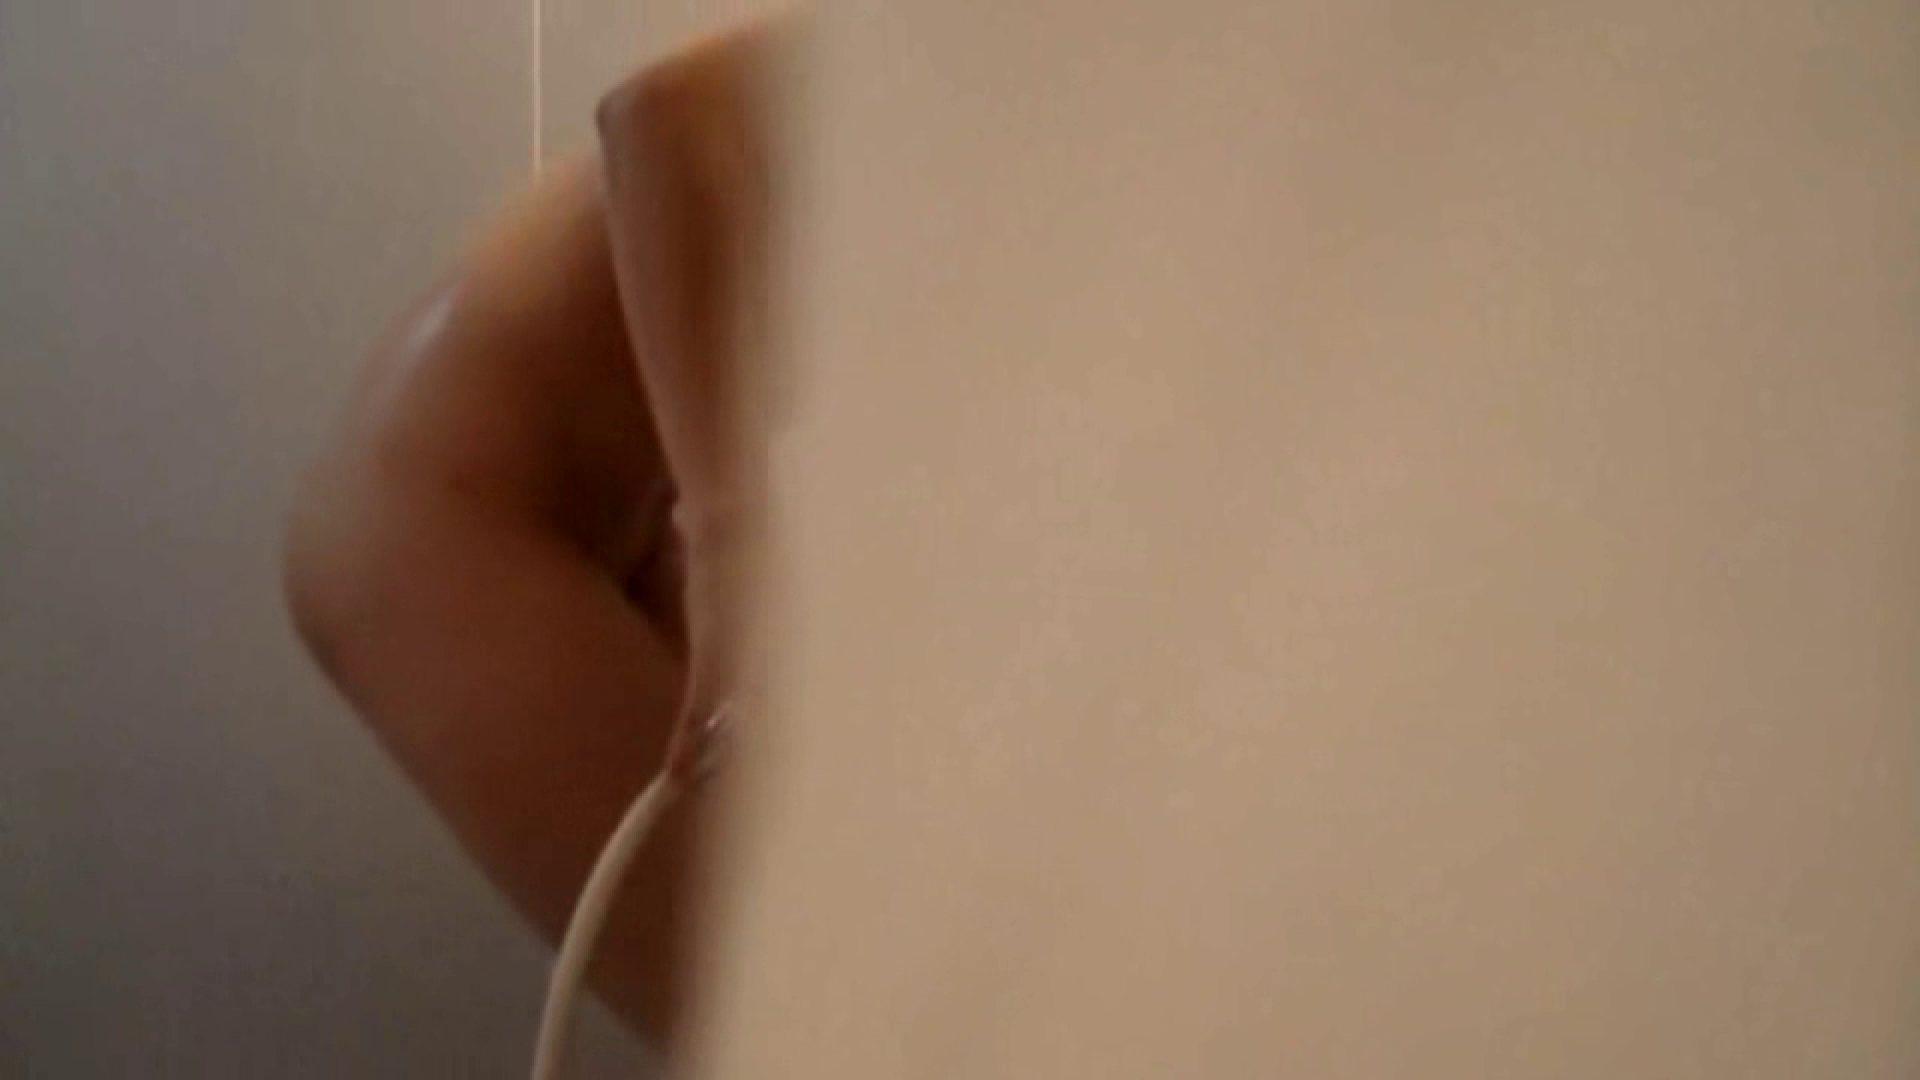 vol.2 葵のグラドル顔負けの爆乳を入浴シーンでどうぞ。 民家 オマンコ無修正動画無料 110枚 28